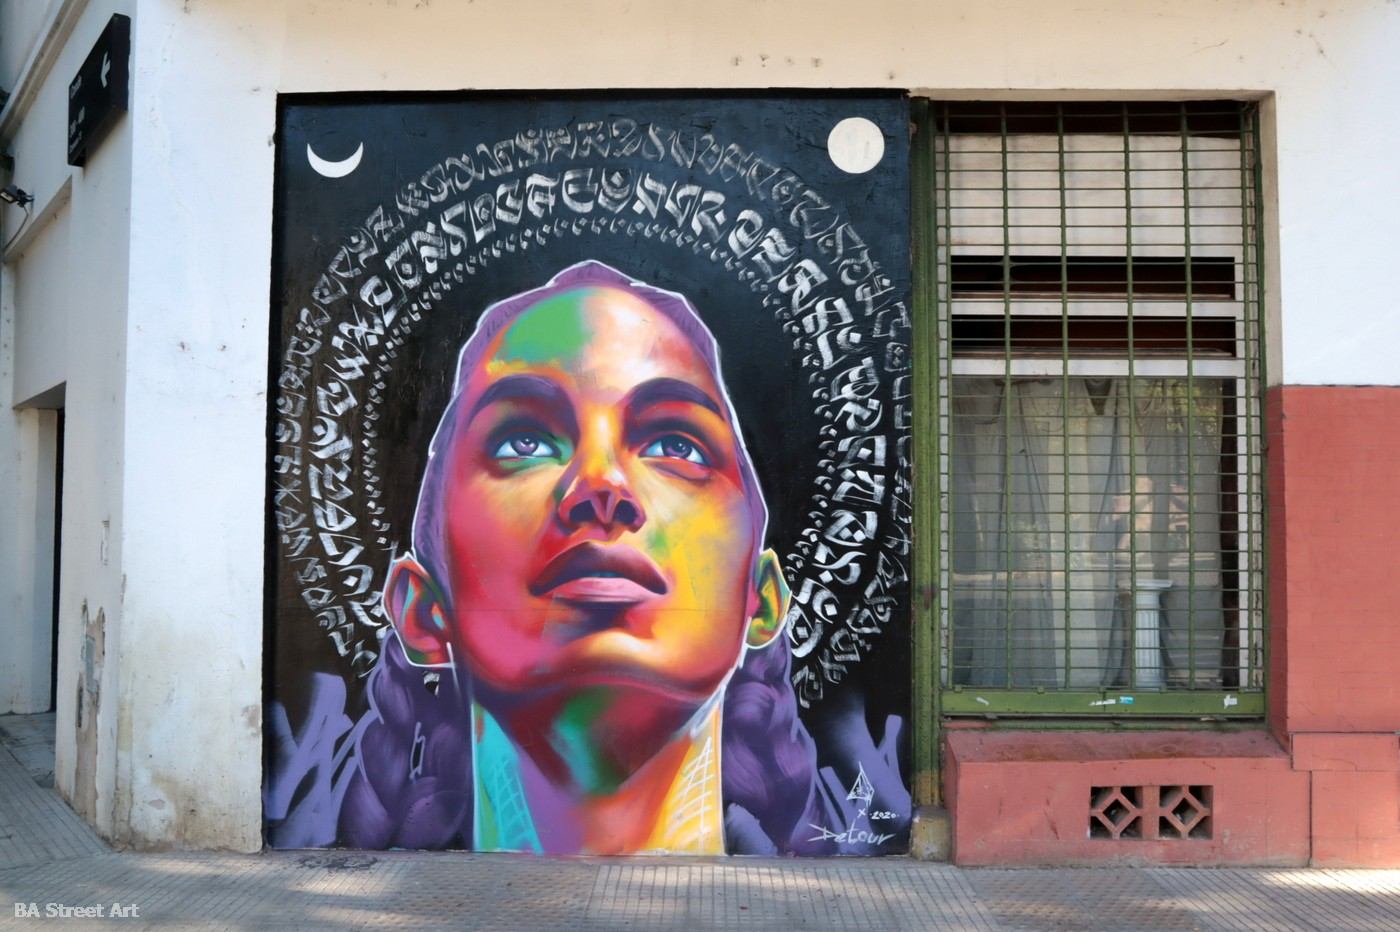 thomas evans artist muralist denver colorado detour buenos aires mural argentina colegiales tour urban art pyramyd